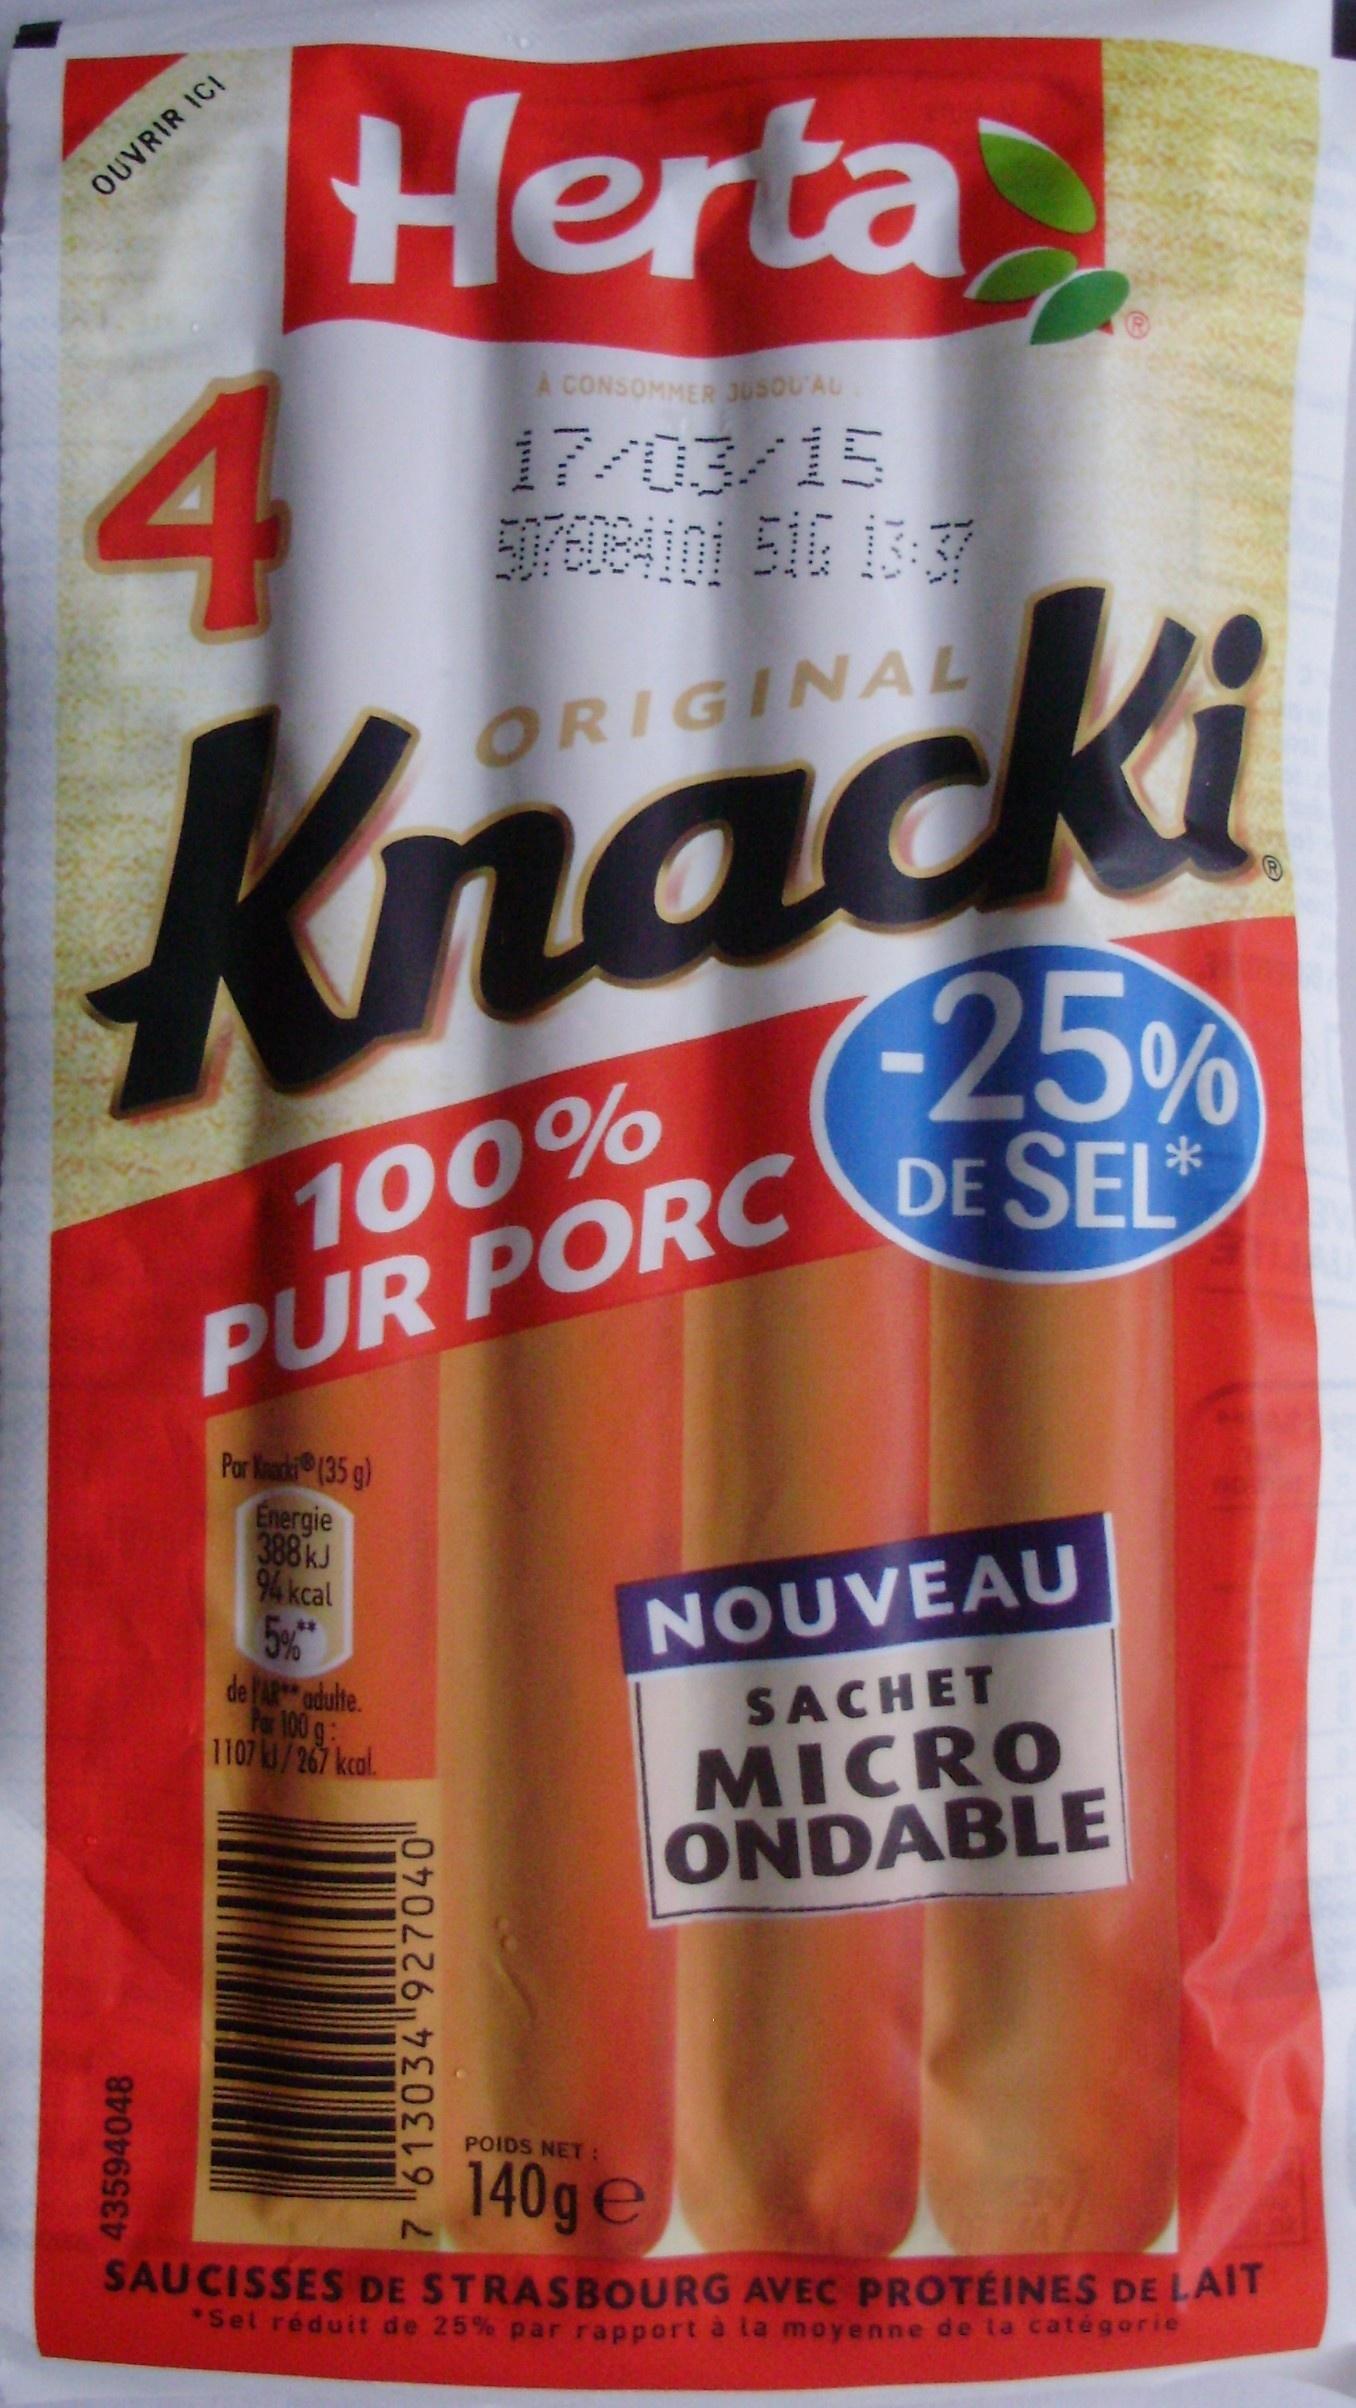 4 Original Knacki, 100 % Pur Porc (- 25 % de Sel) - Product